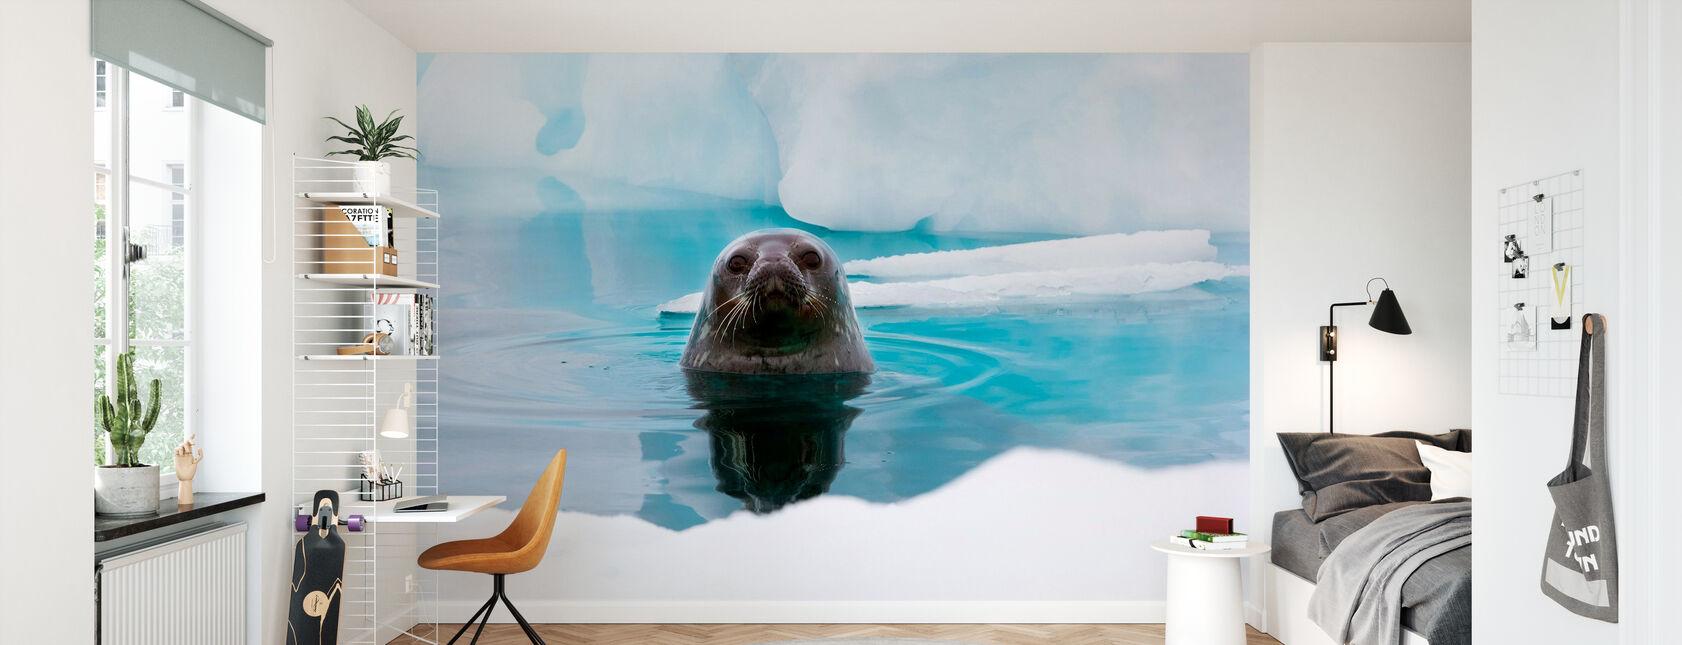 Curious Seal - Wallpaper - Kids Room